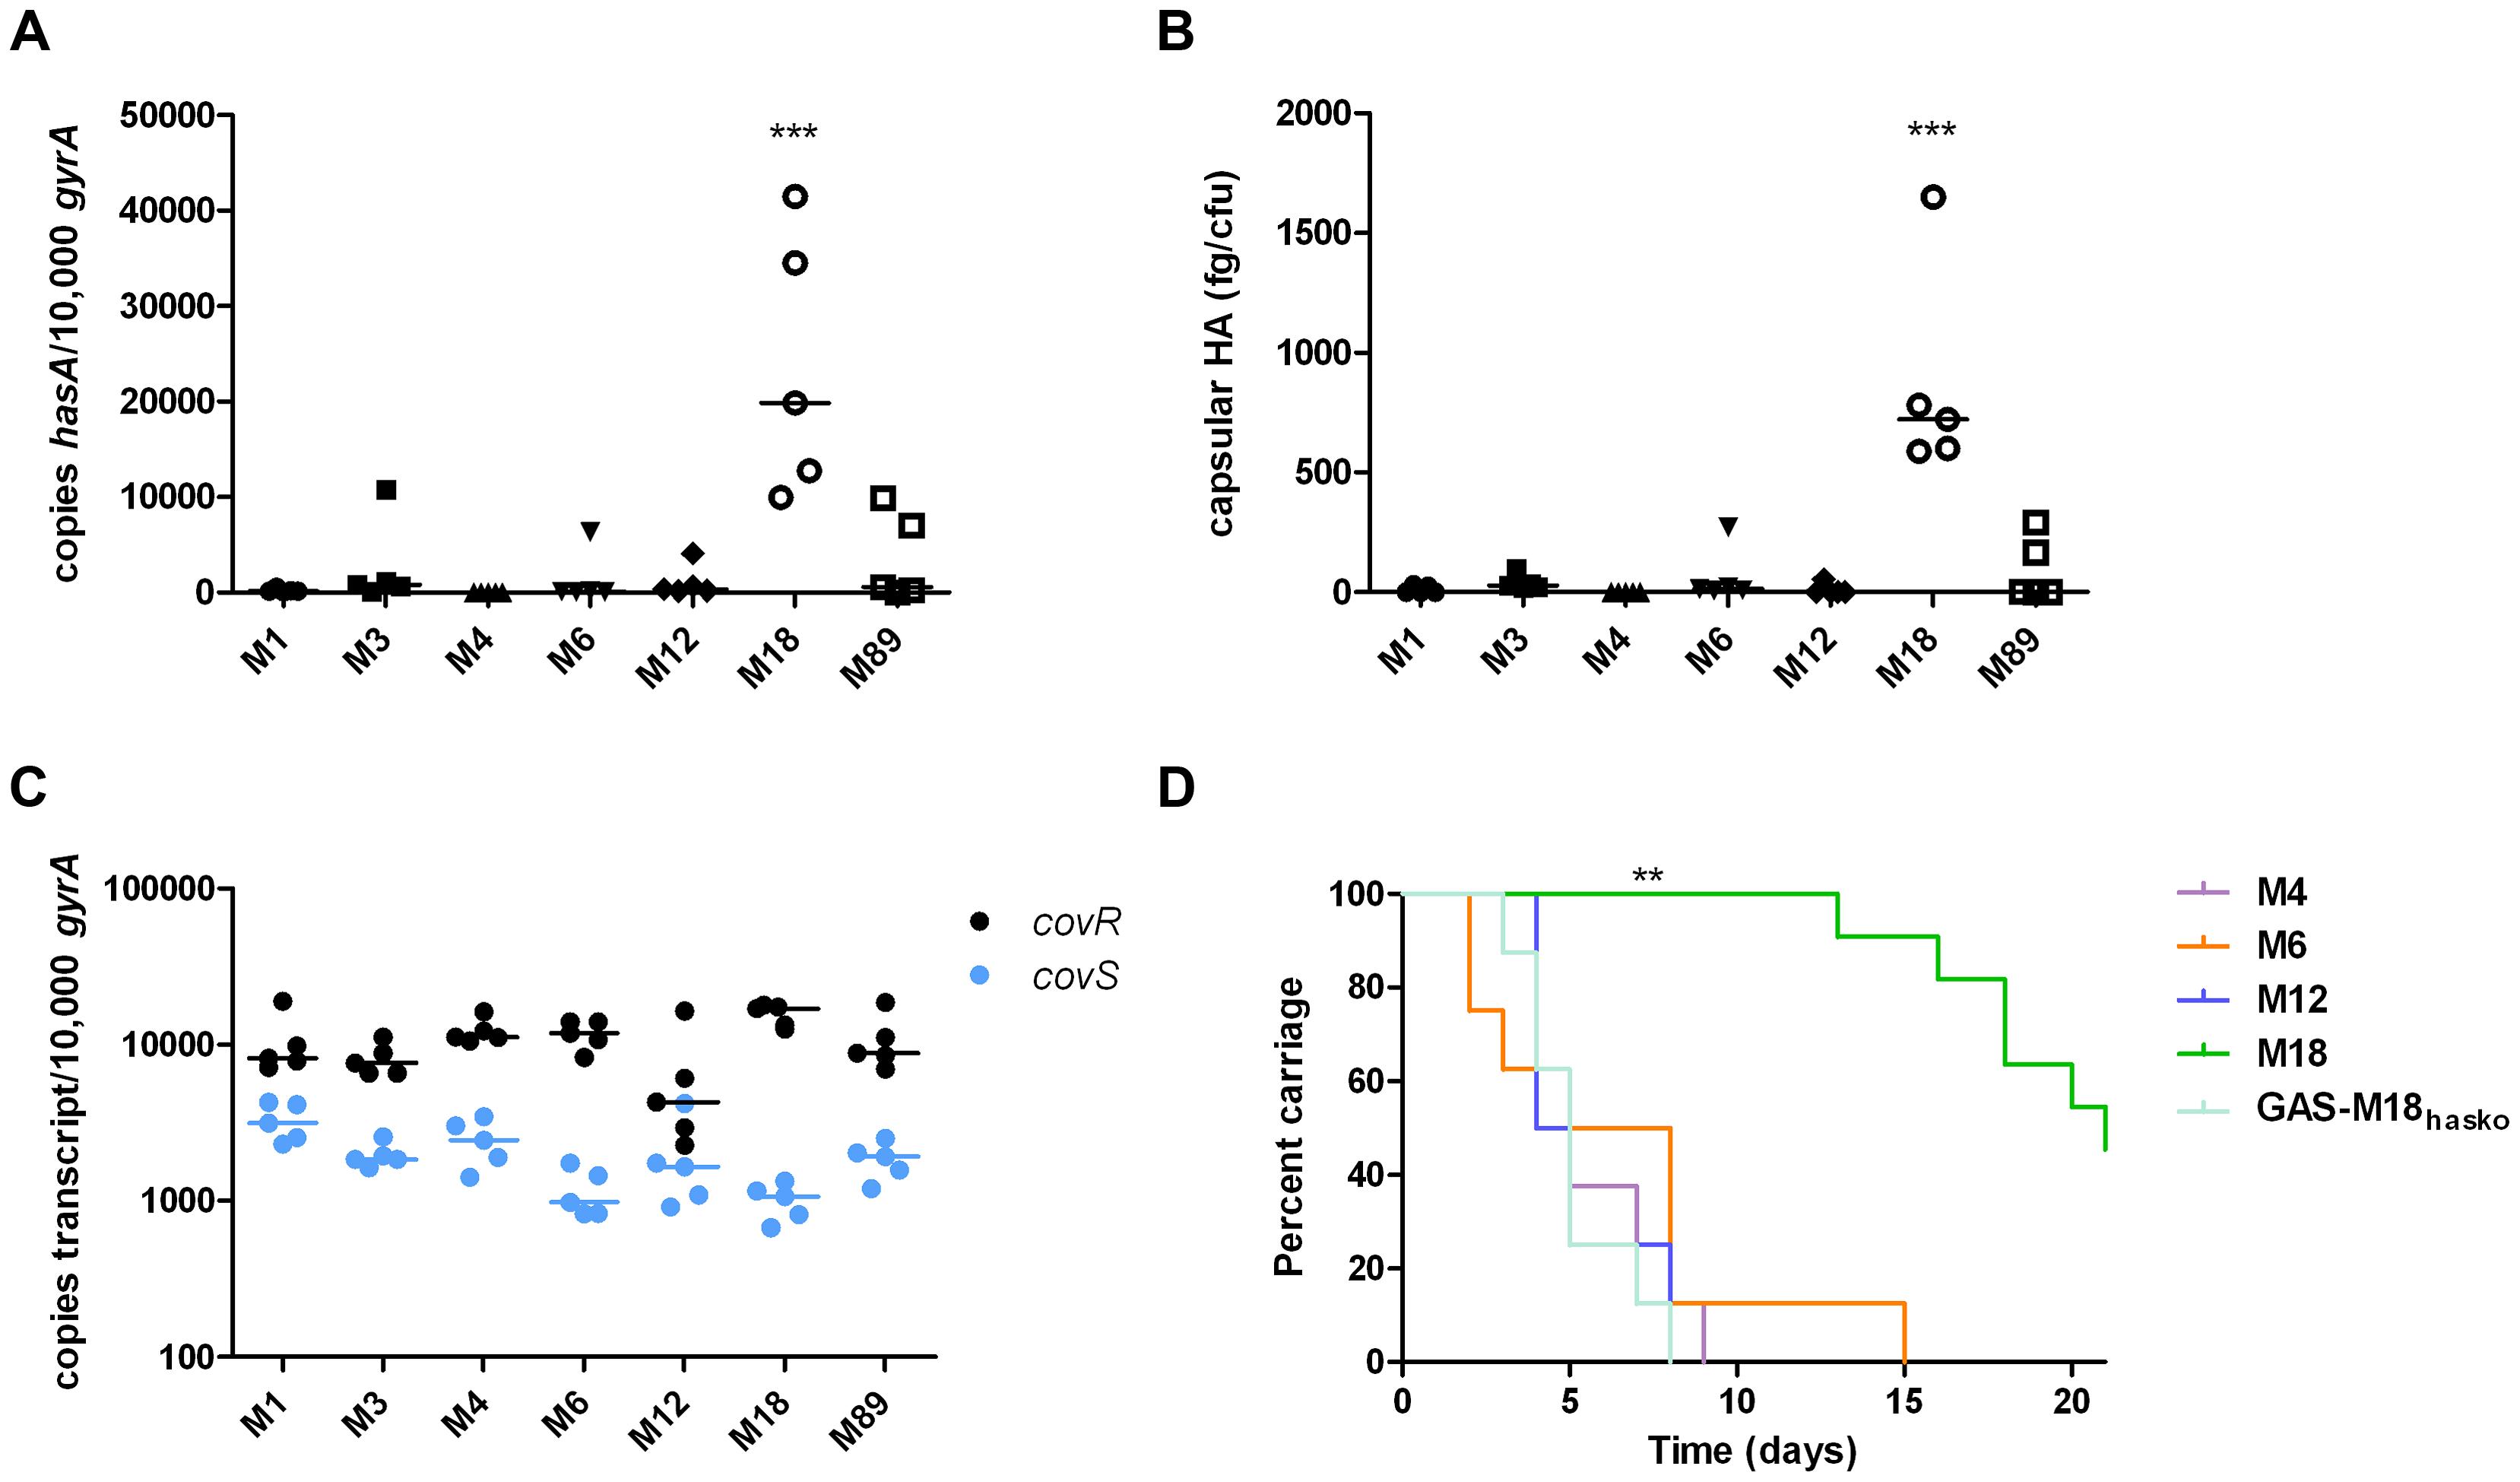 Serotype M18 GAS display a unique hyper-encapsulation phenotype which mediates enhanced nasopharyngeal carriage longevity.